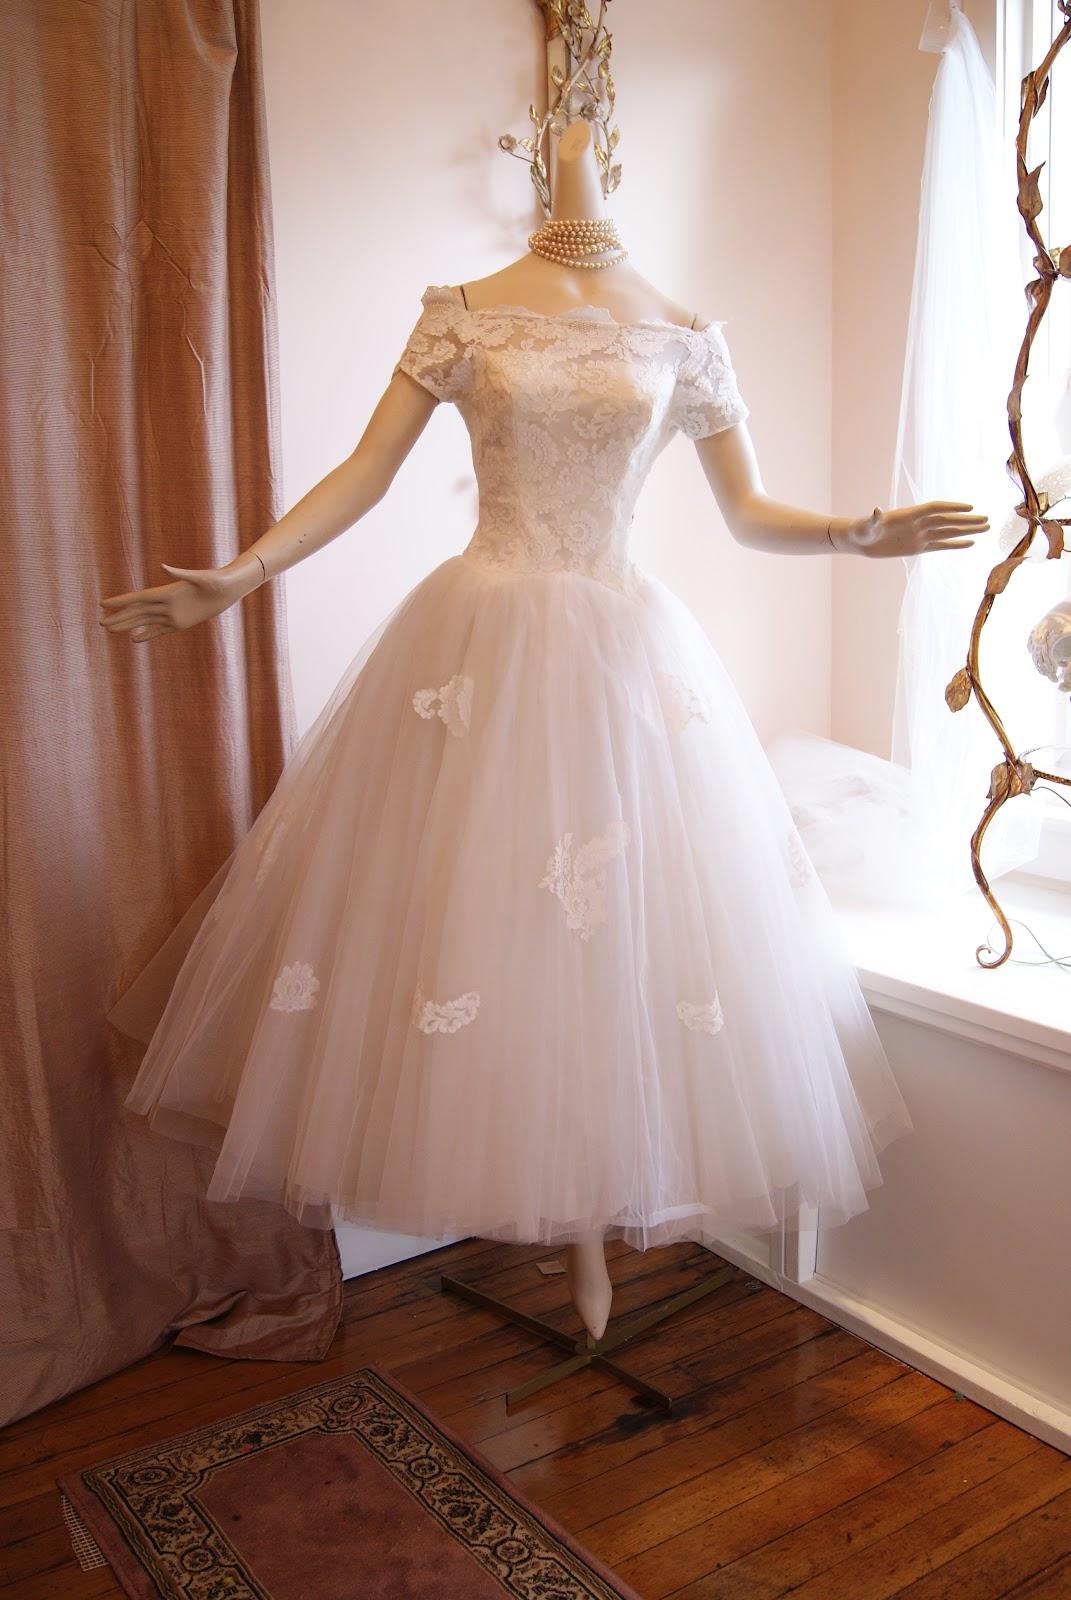 Xtabay vintage clothing boutique portland oregon for Funny face wedding dress